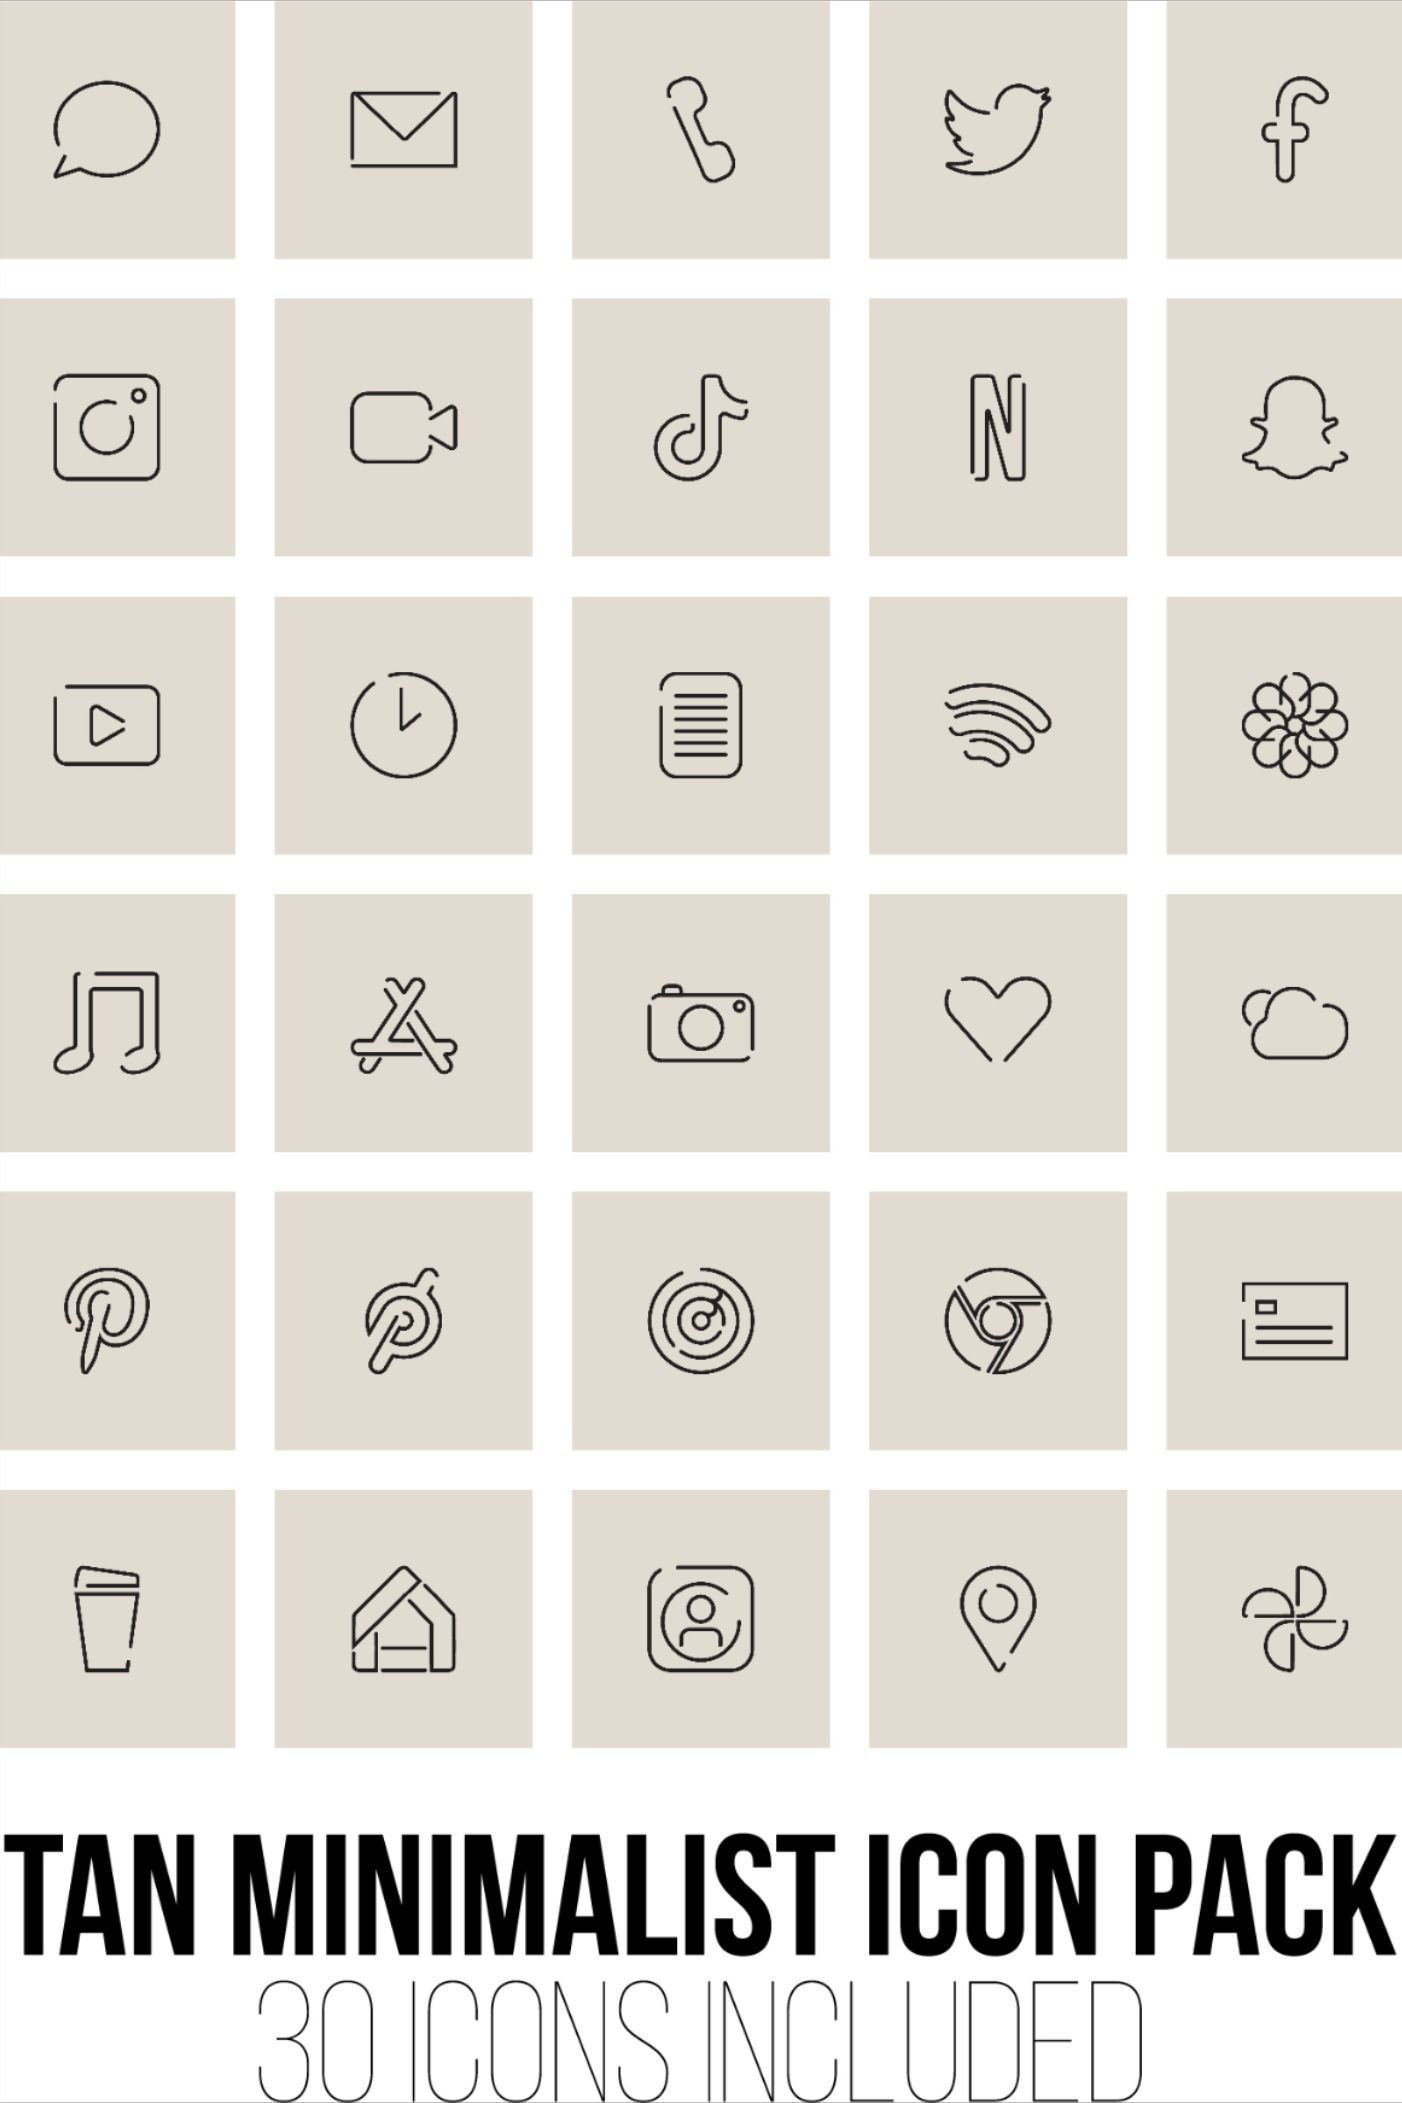 Tan Minimalist Icon Pack